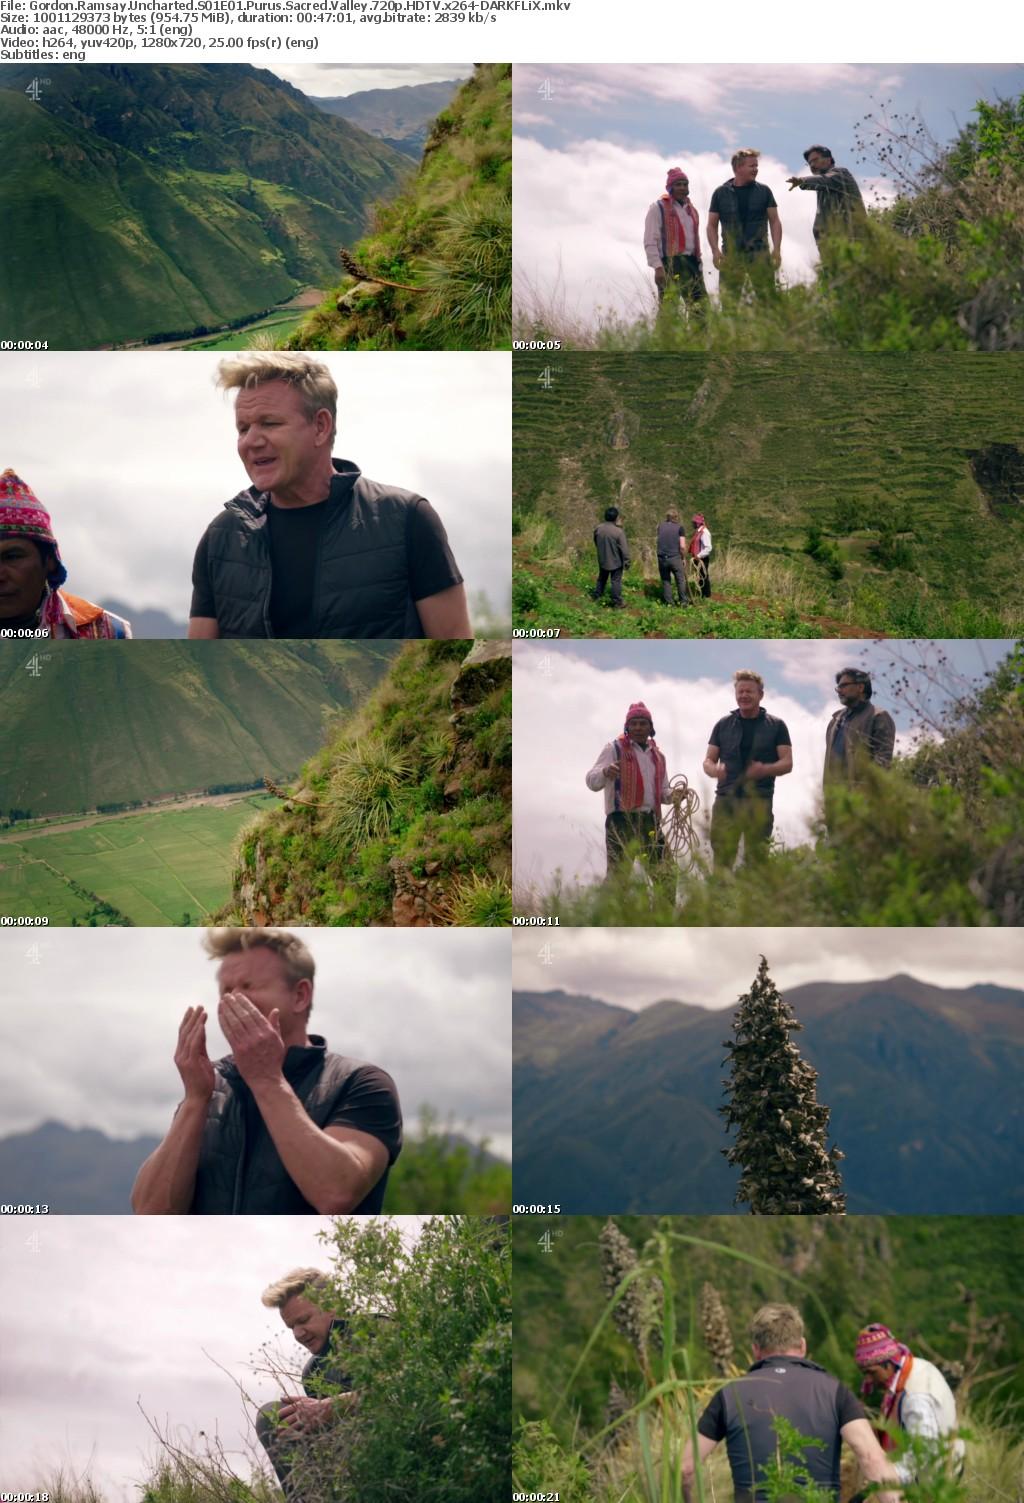 Gordon Ramsay Uncharted S01E01 Purus Sacred Valley 720p HDTV x264-DARKFLiX